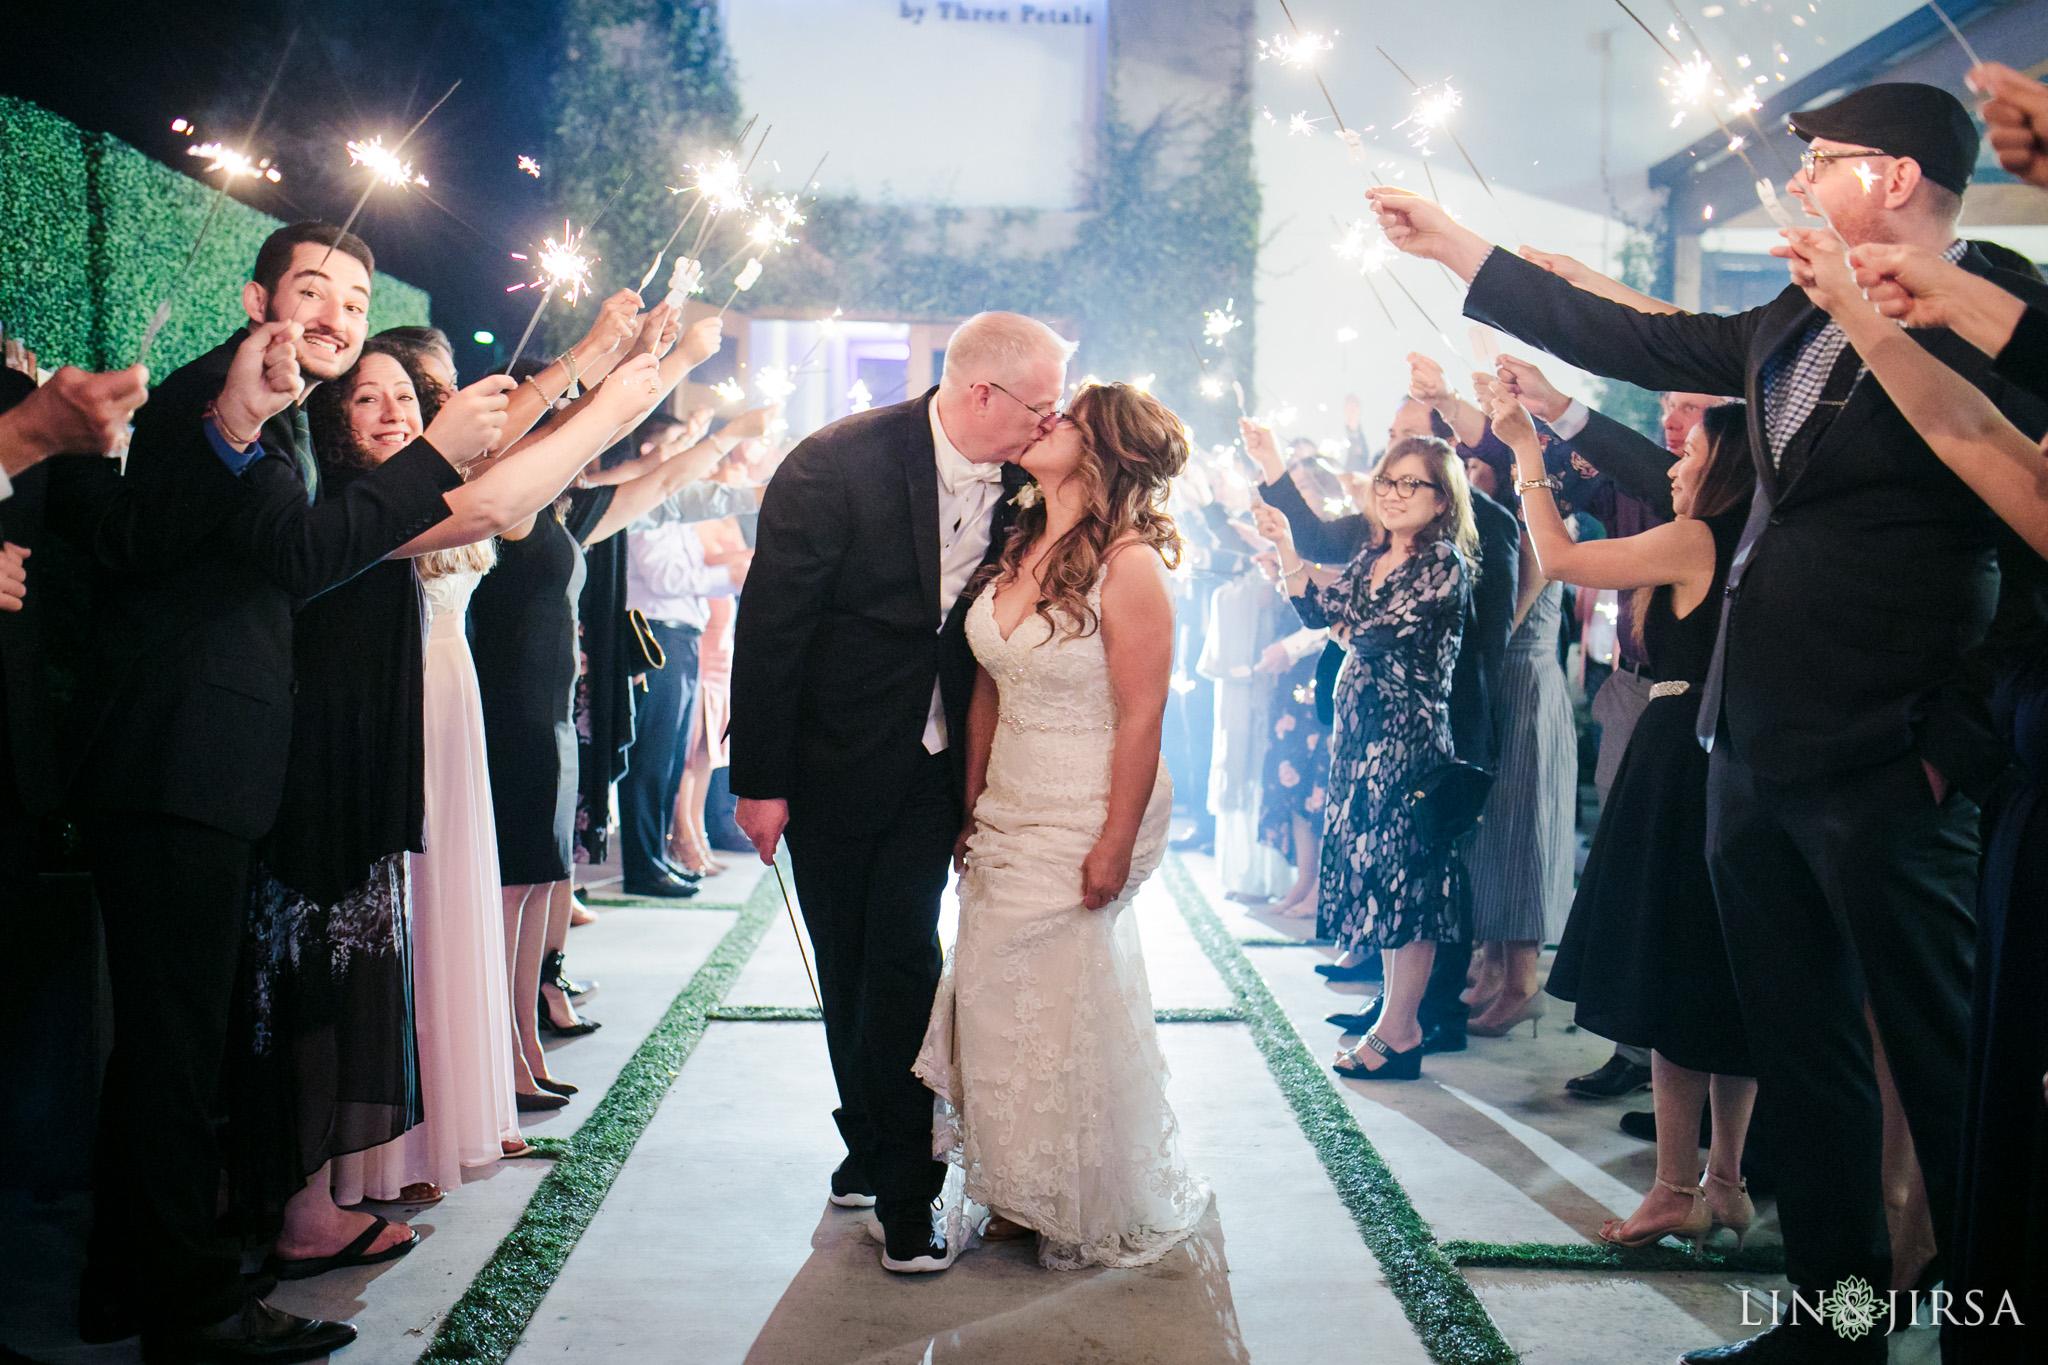 23 venue by three petals huntington beach wedding photography 1